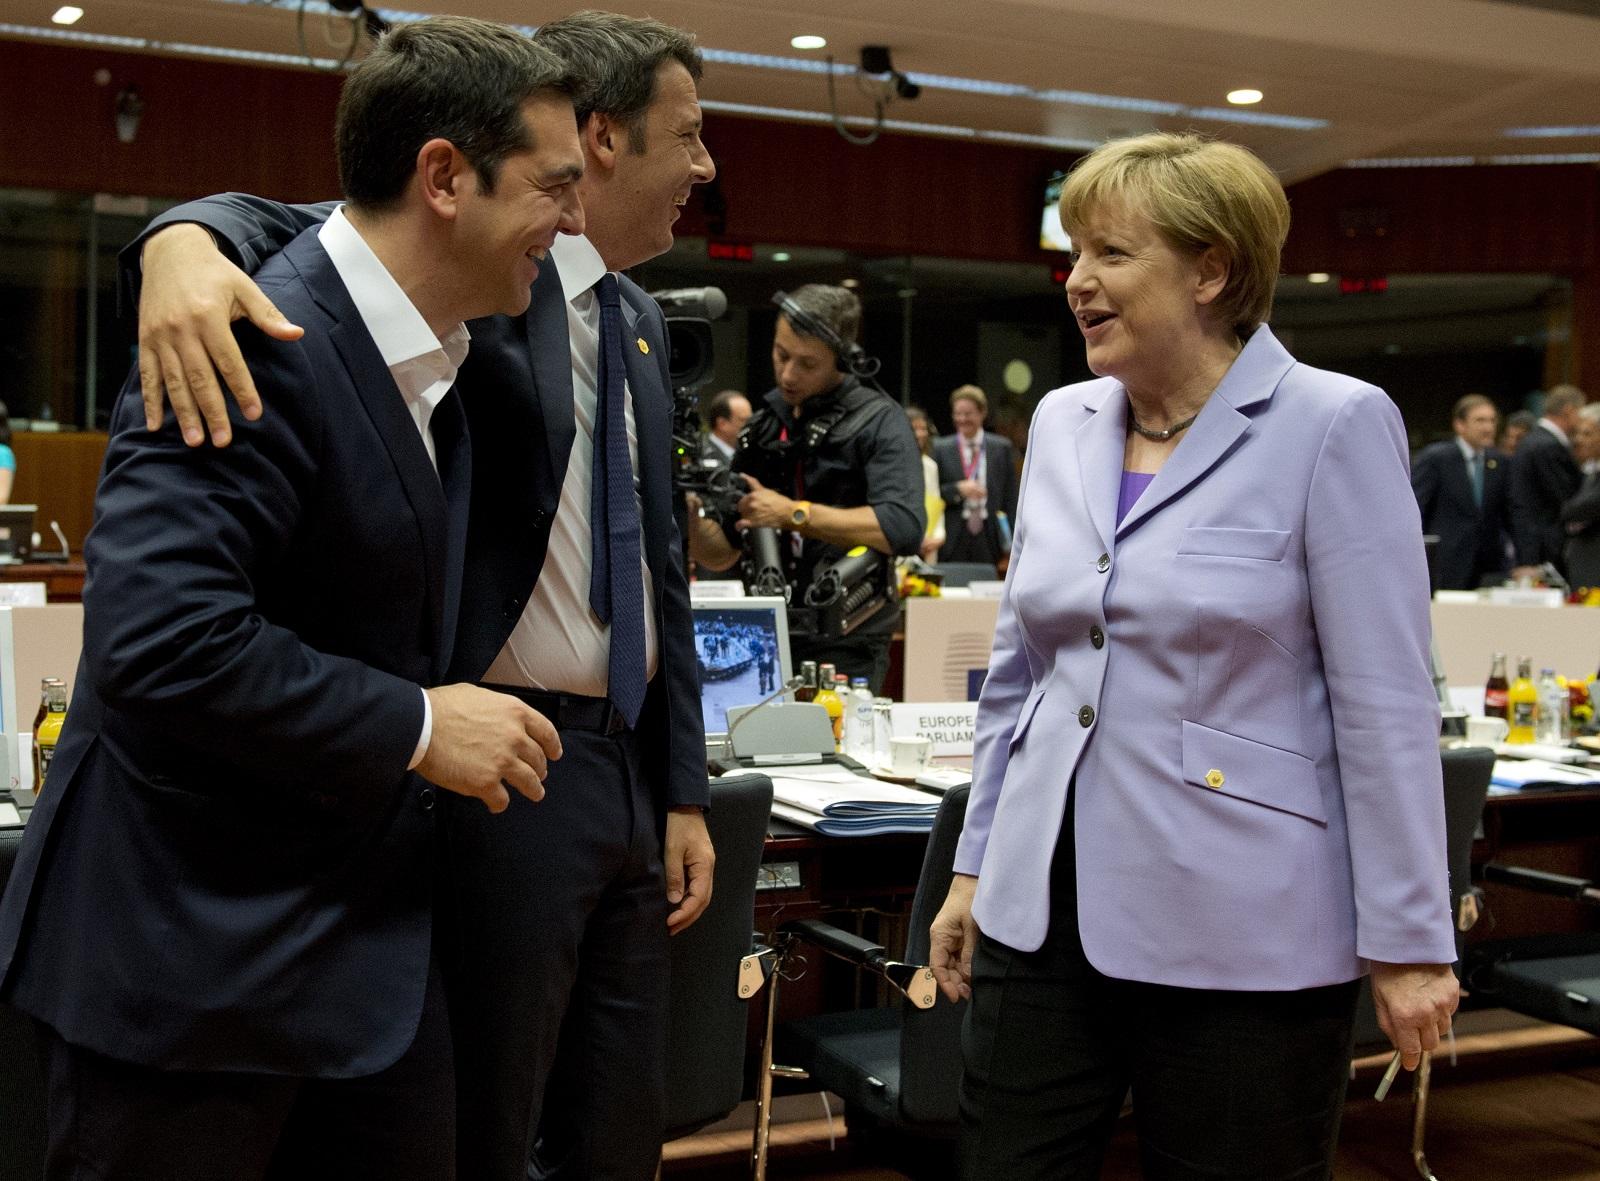 Angela Merkel, Matteo Renzi and Alexis Tsipras